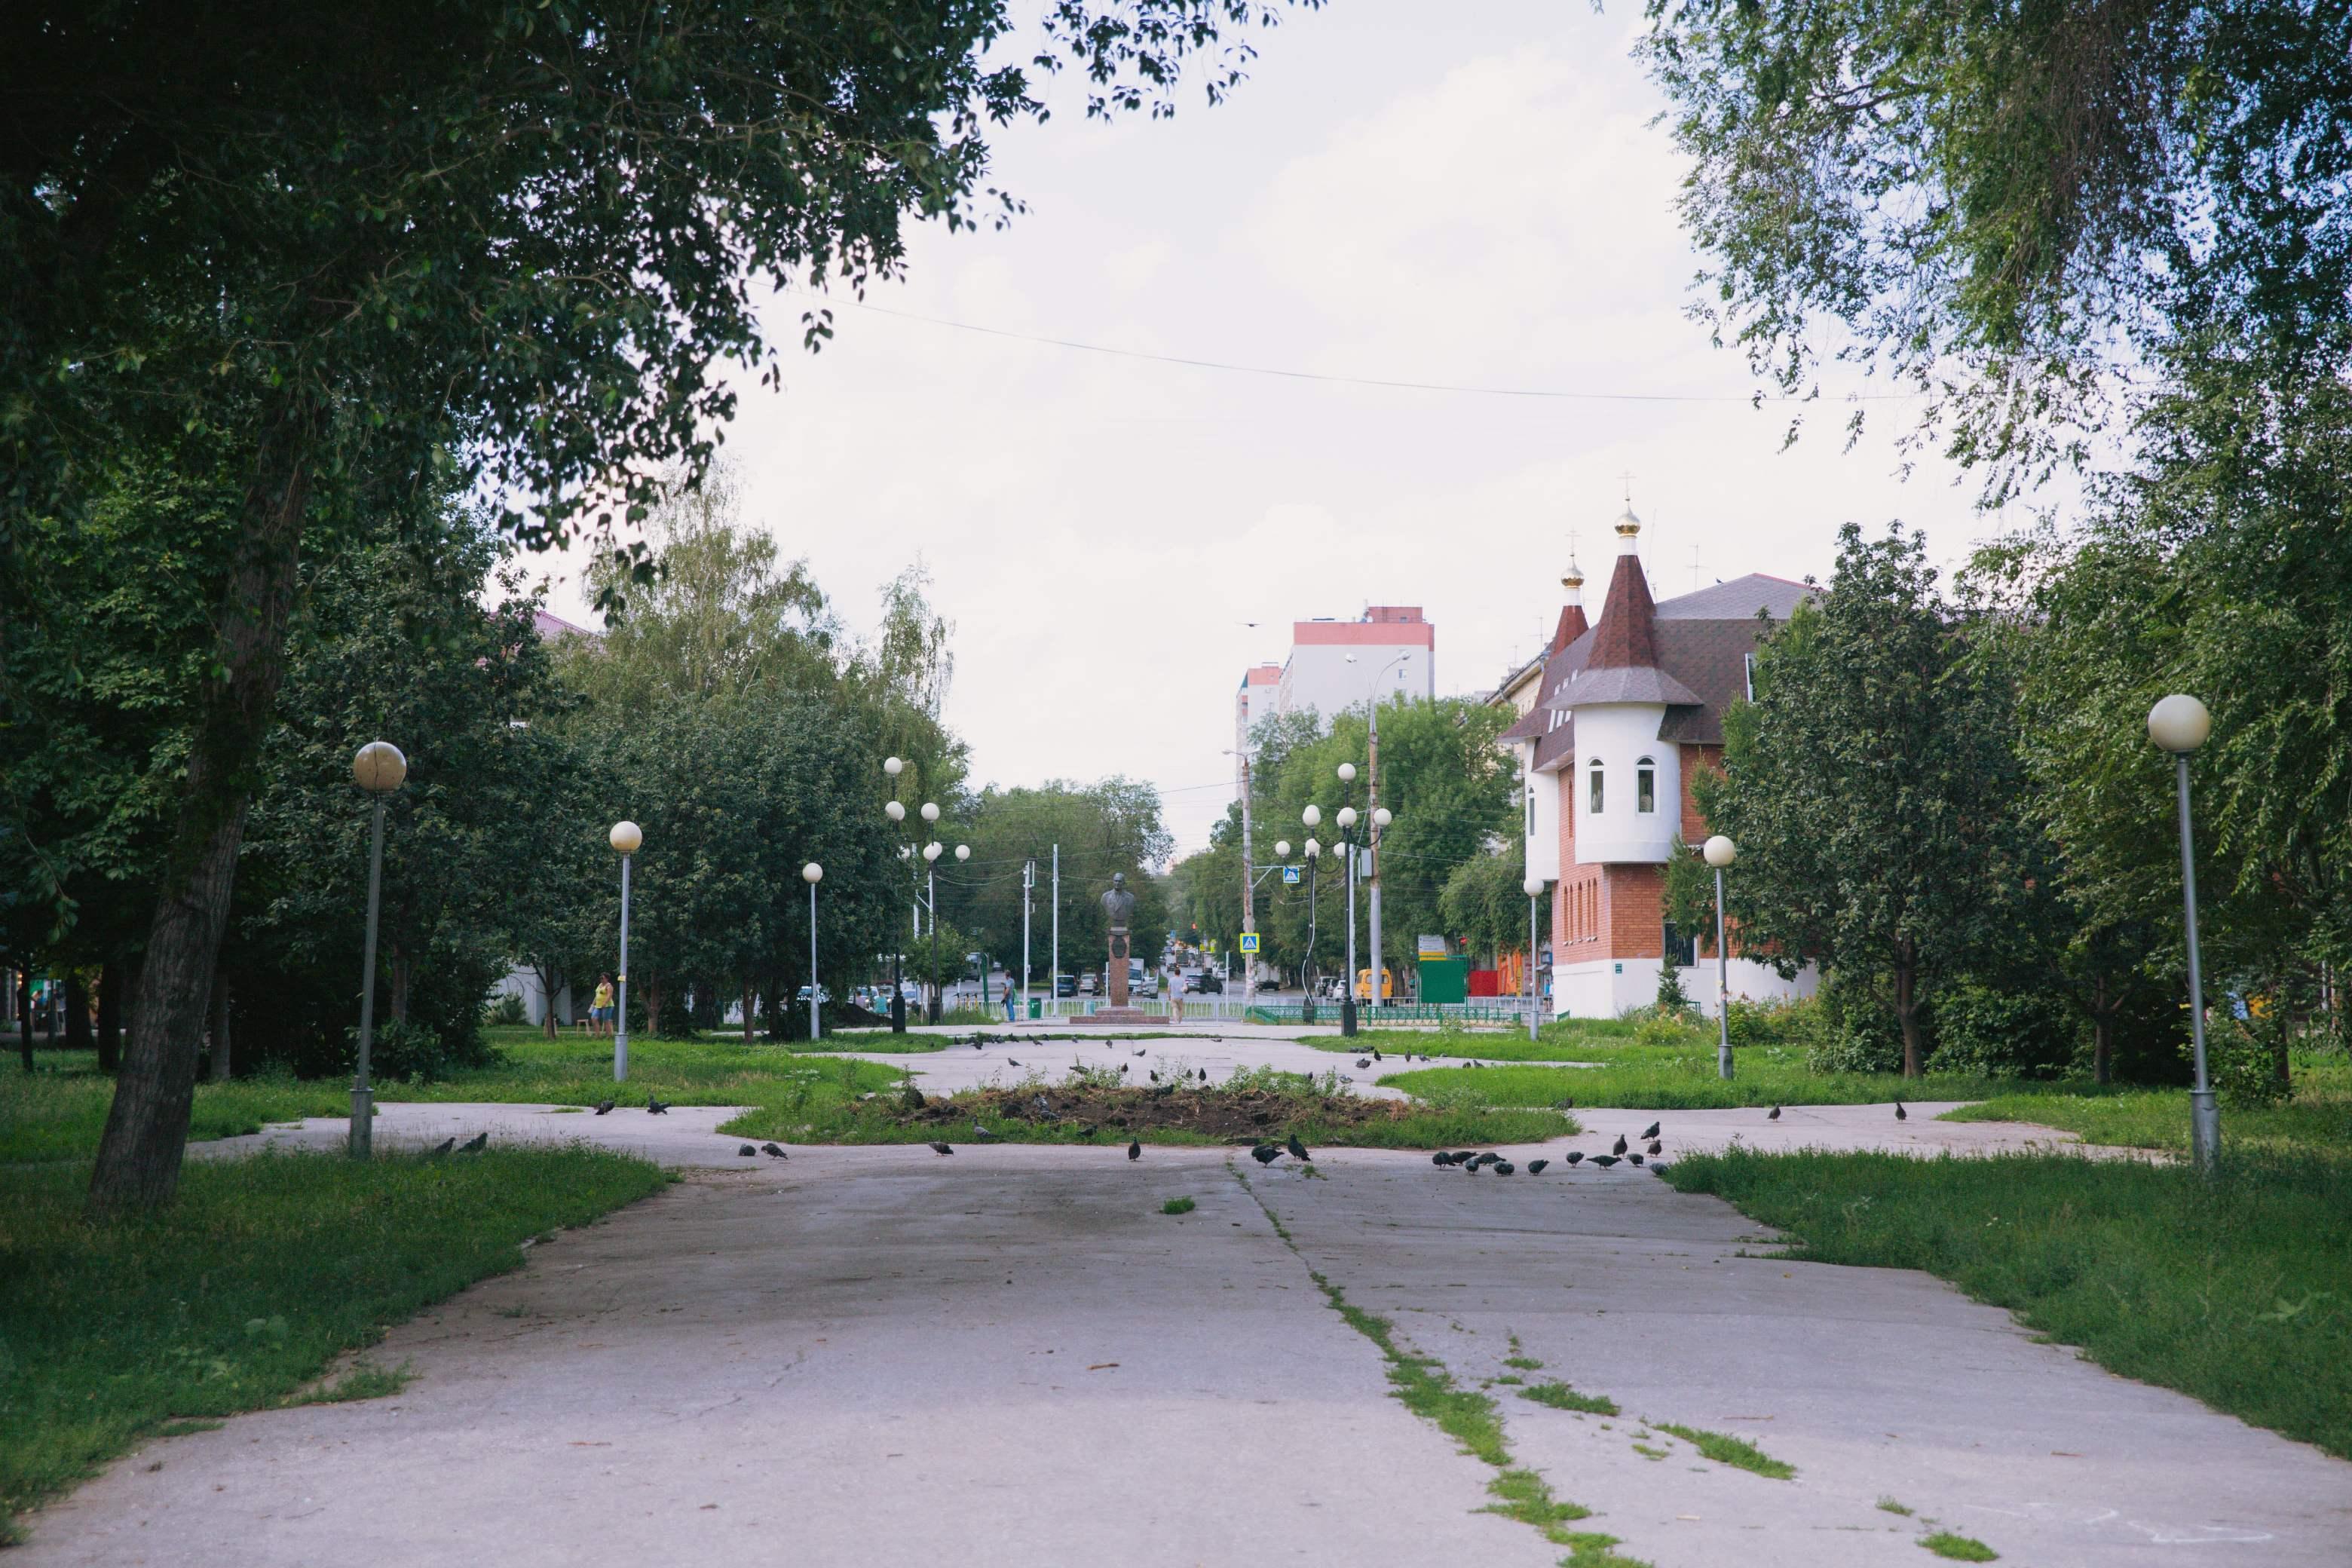 Сквер с бюстом Кузнецова